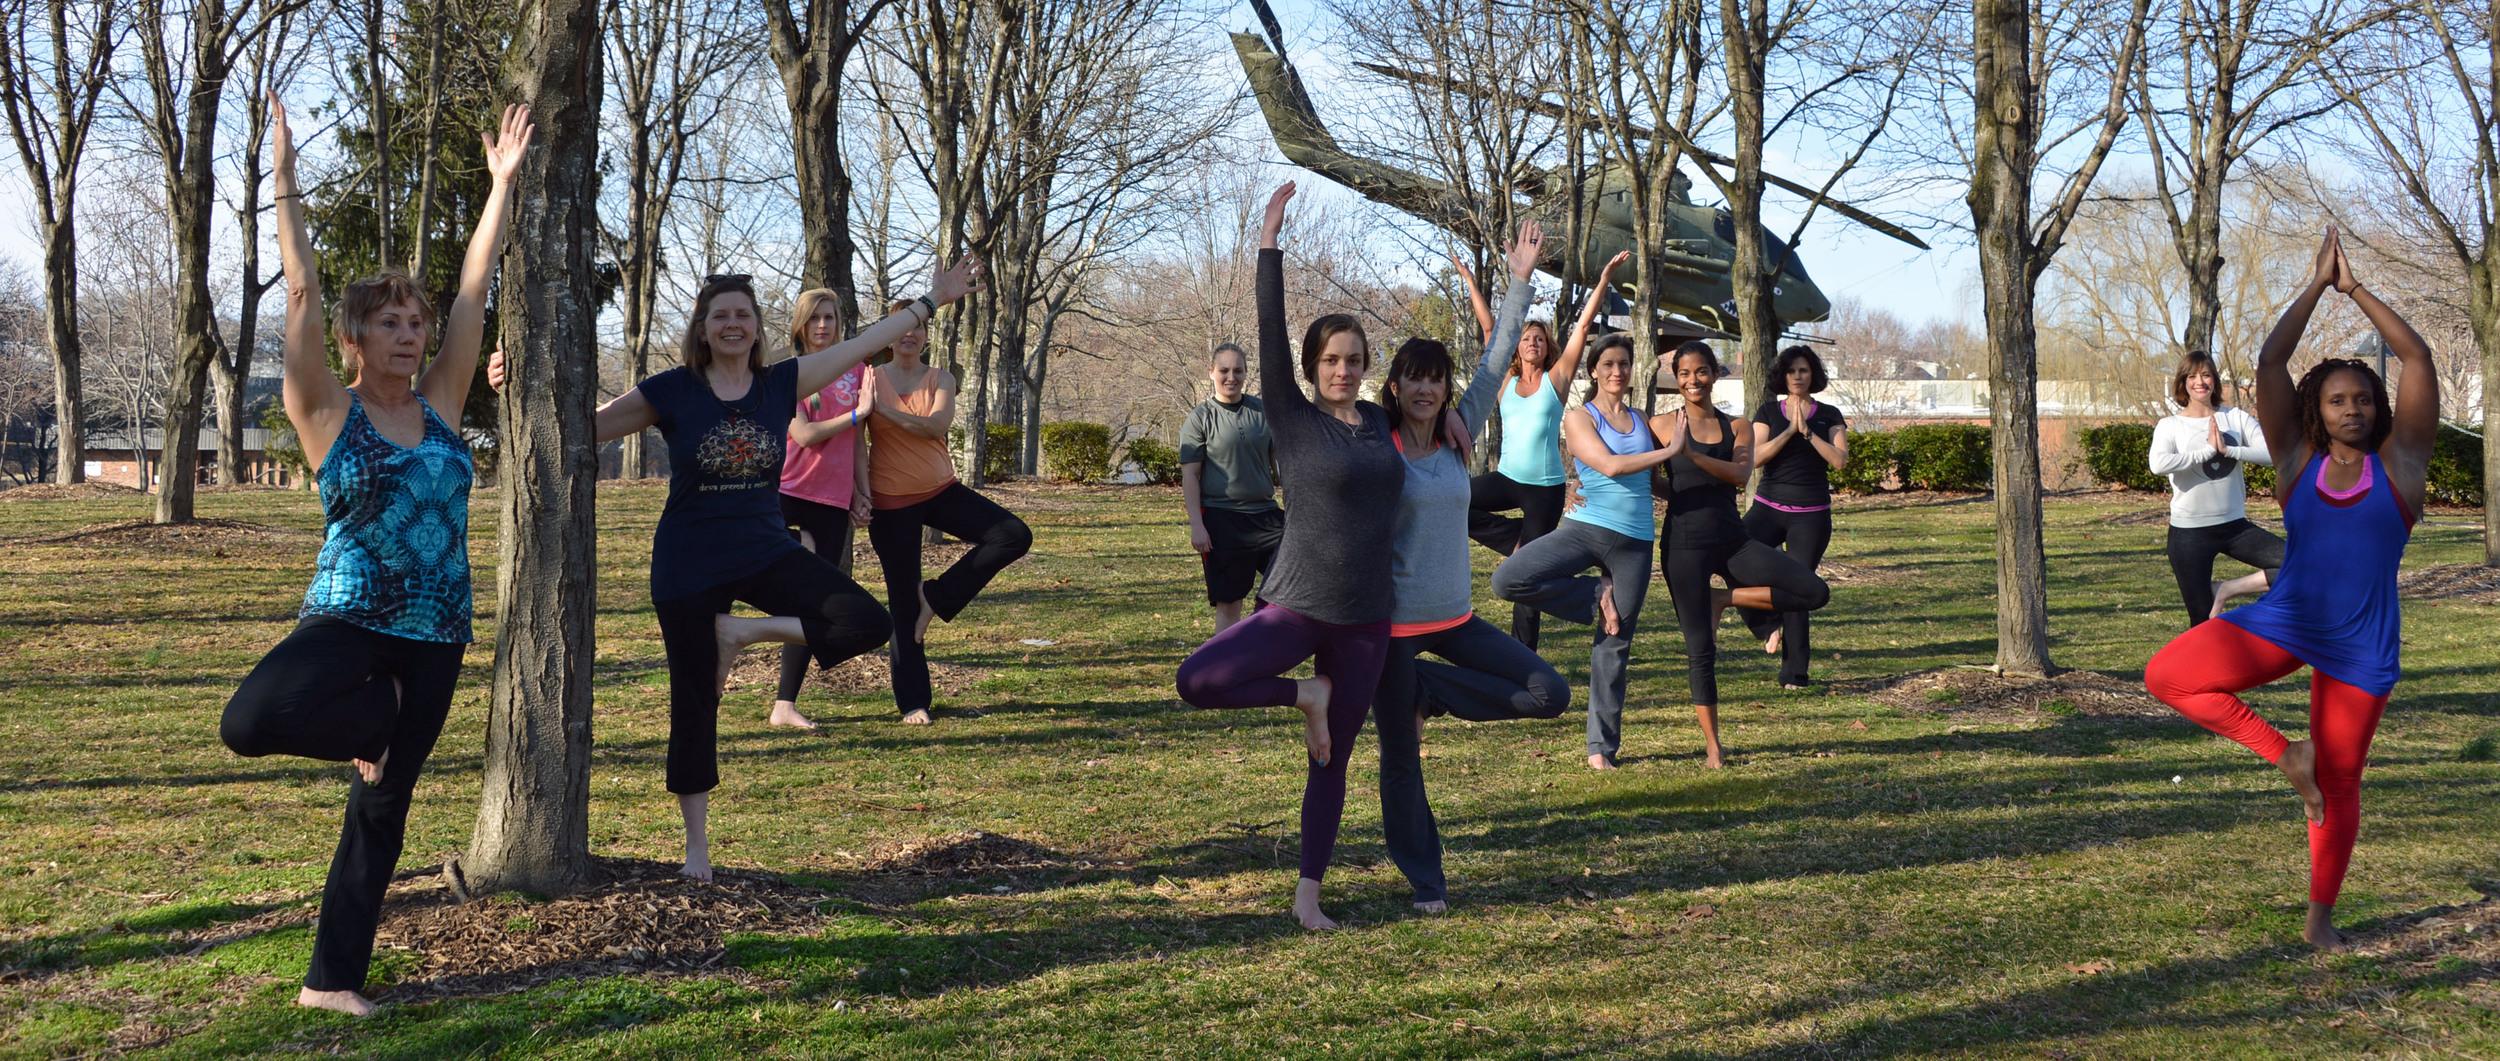 Bristol Yoga in Bristol Tennessee